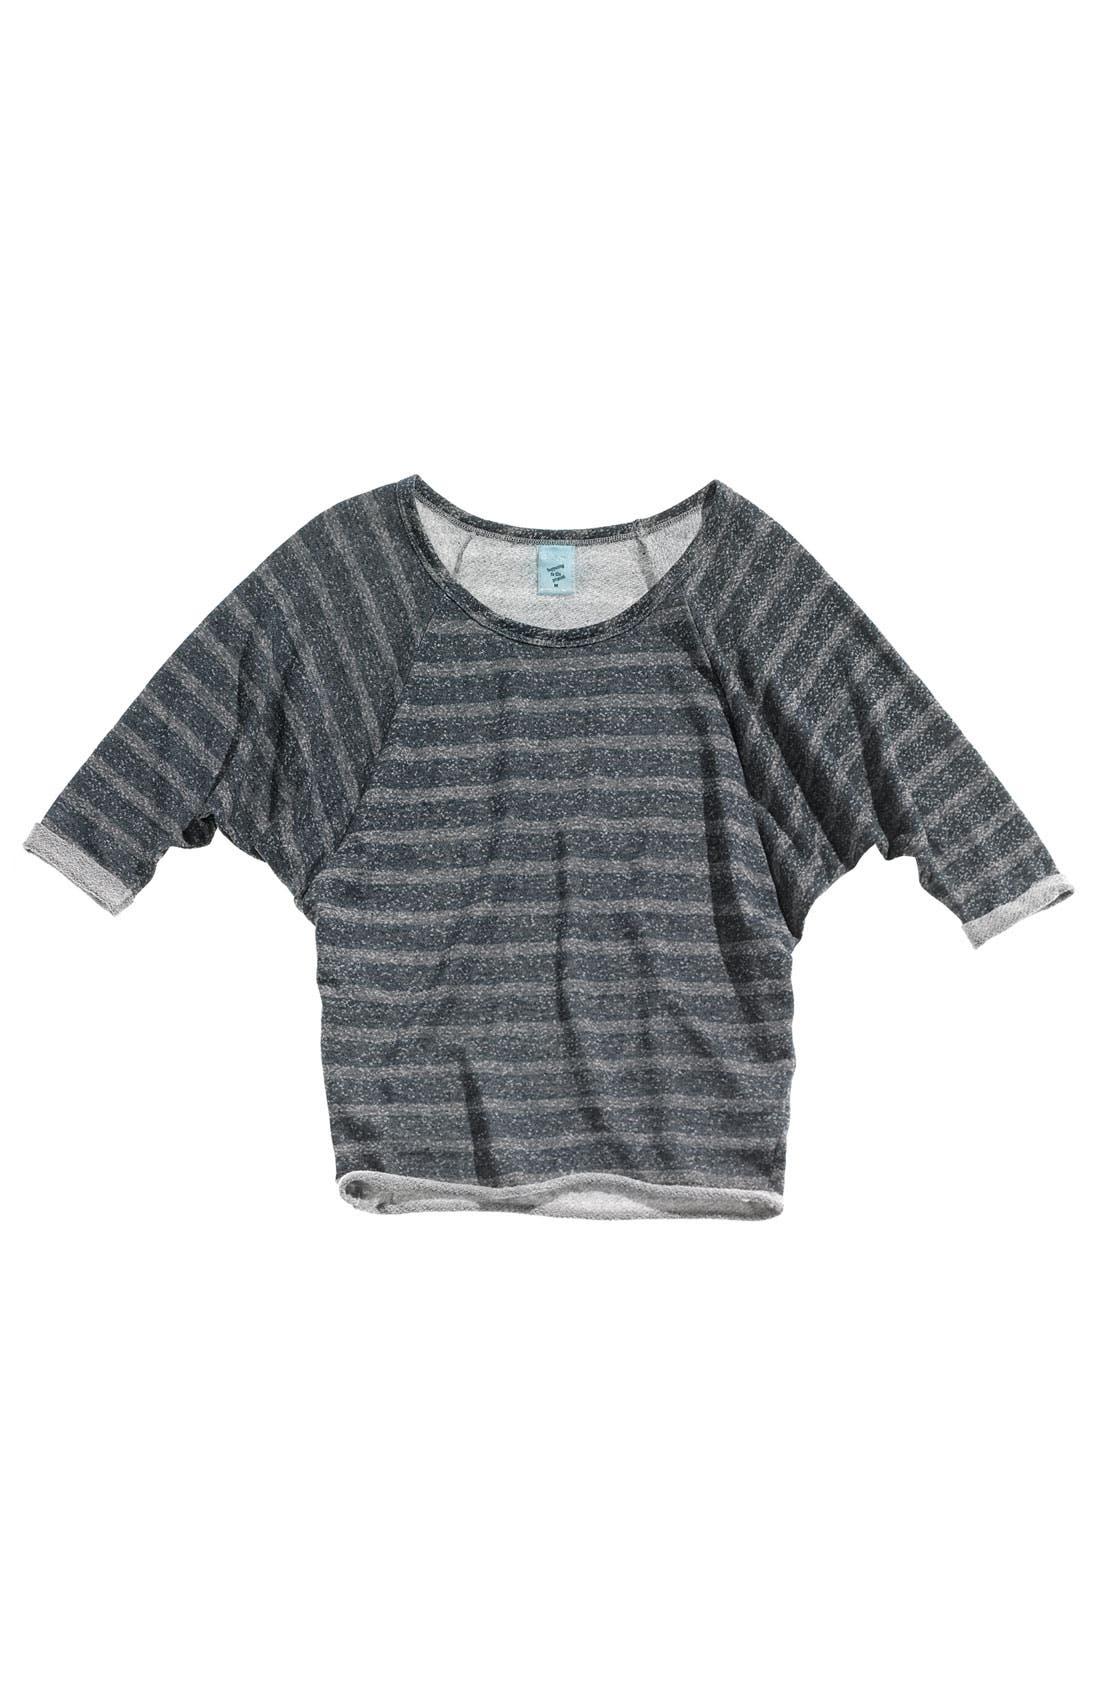 Alternate Image 2  - h.i.p. Raglan Sleeve Fleece Top (Juniors)